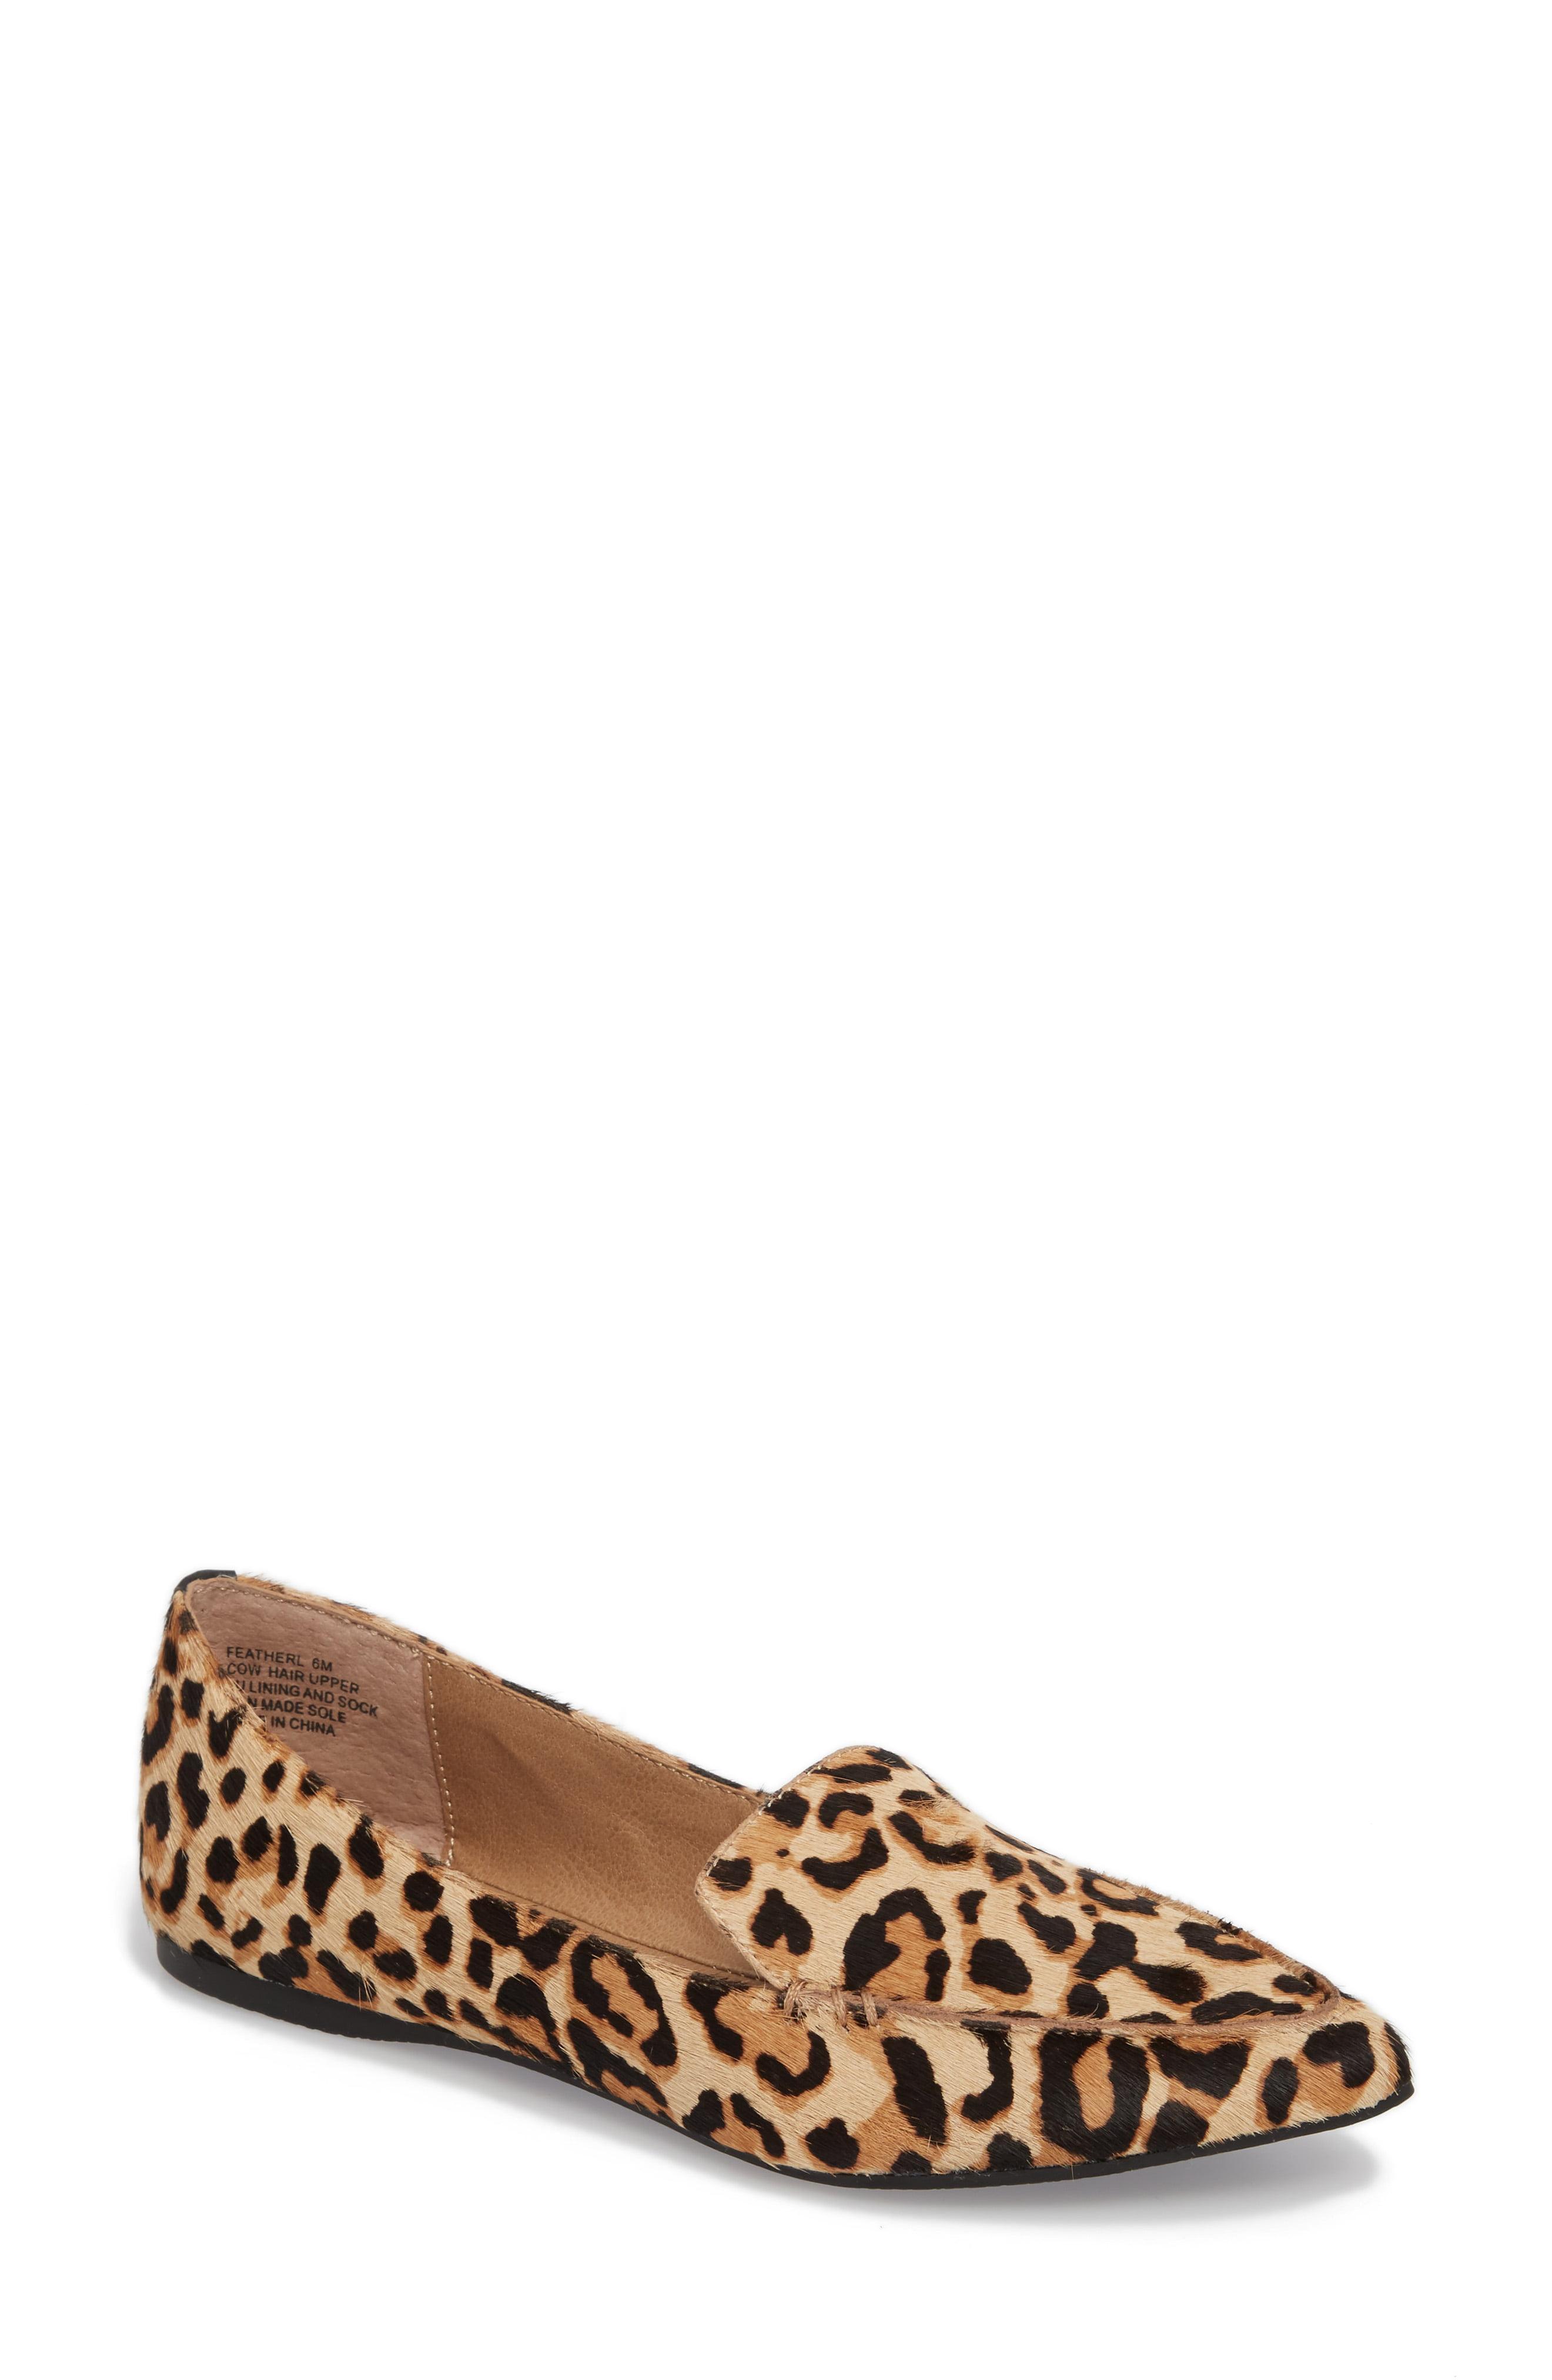 3e4080faf9a Lyst - Steve Madden Feather-l Genuine Calf Hair Loafer Flat